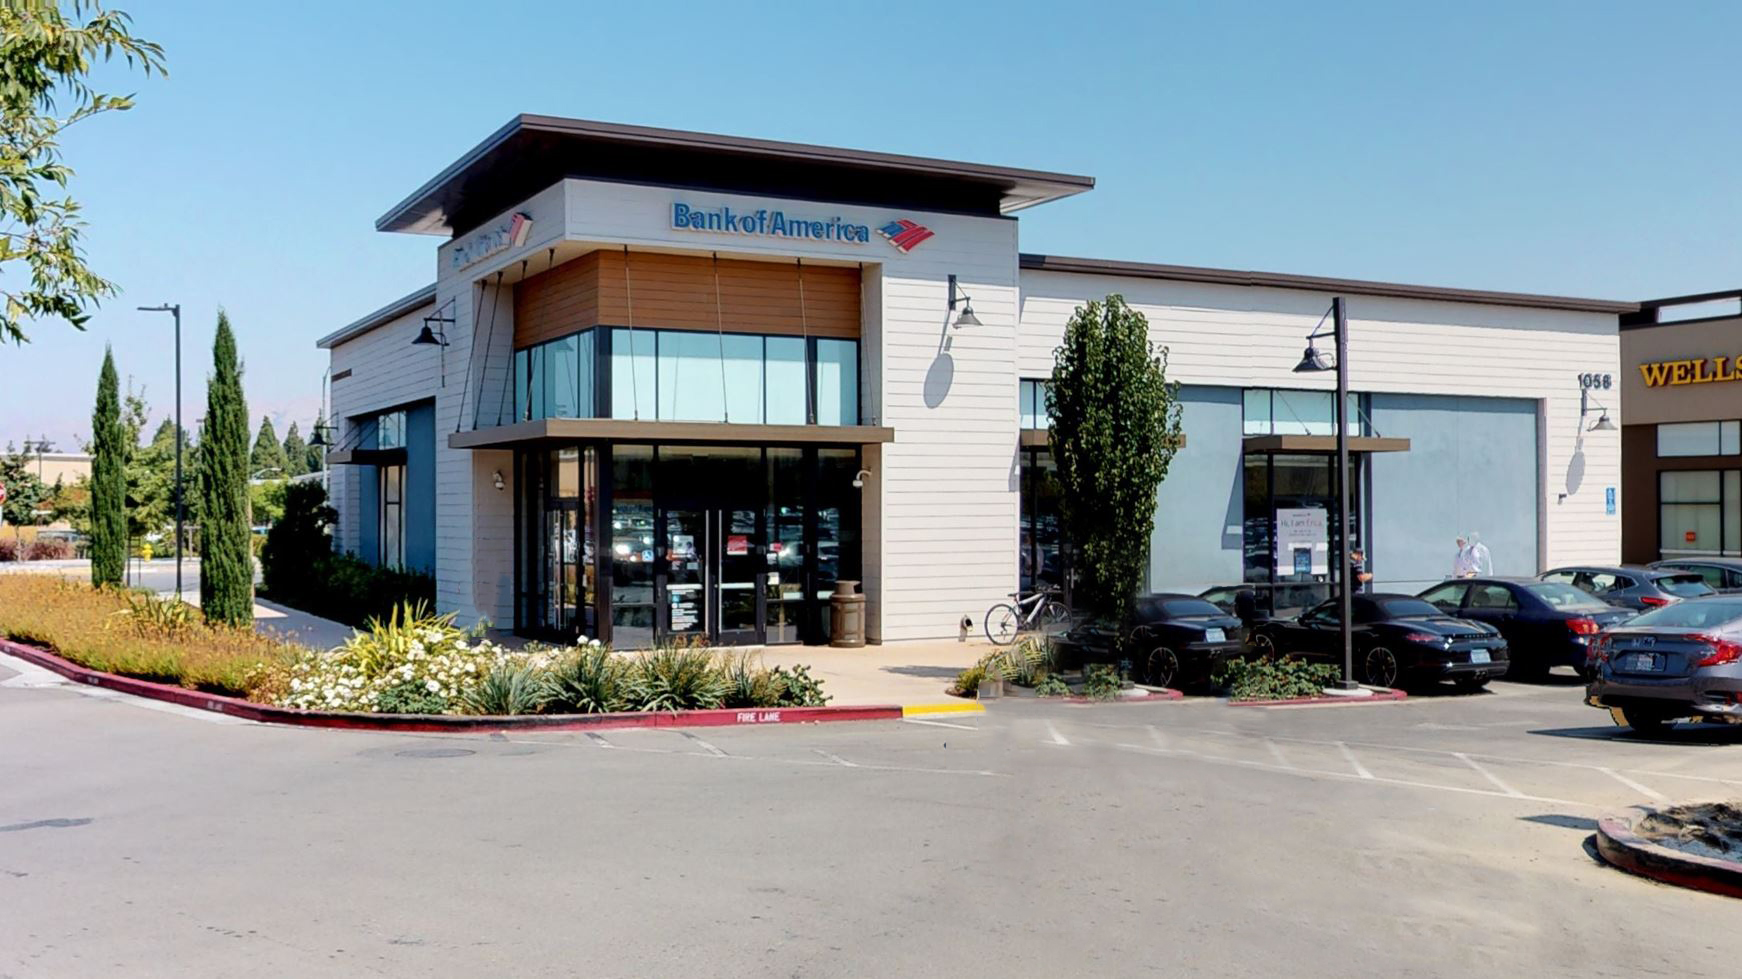 Bank of America financial center with walk-up ATM   1058 E Brokaw Rd, San Jose, CA 95131